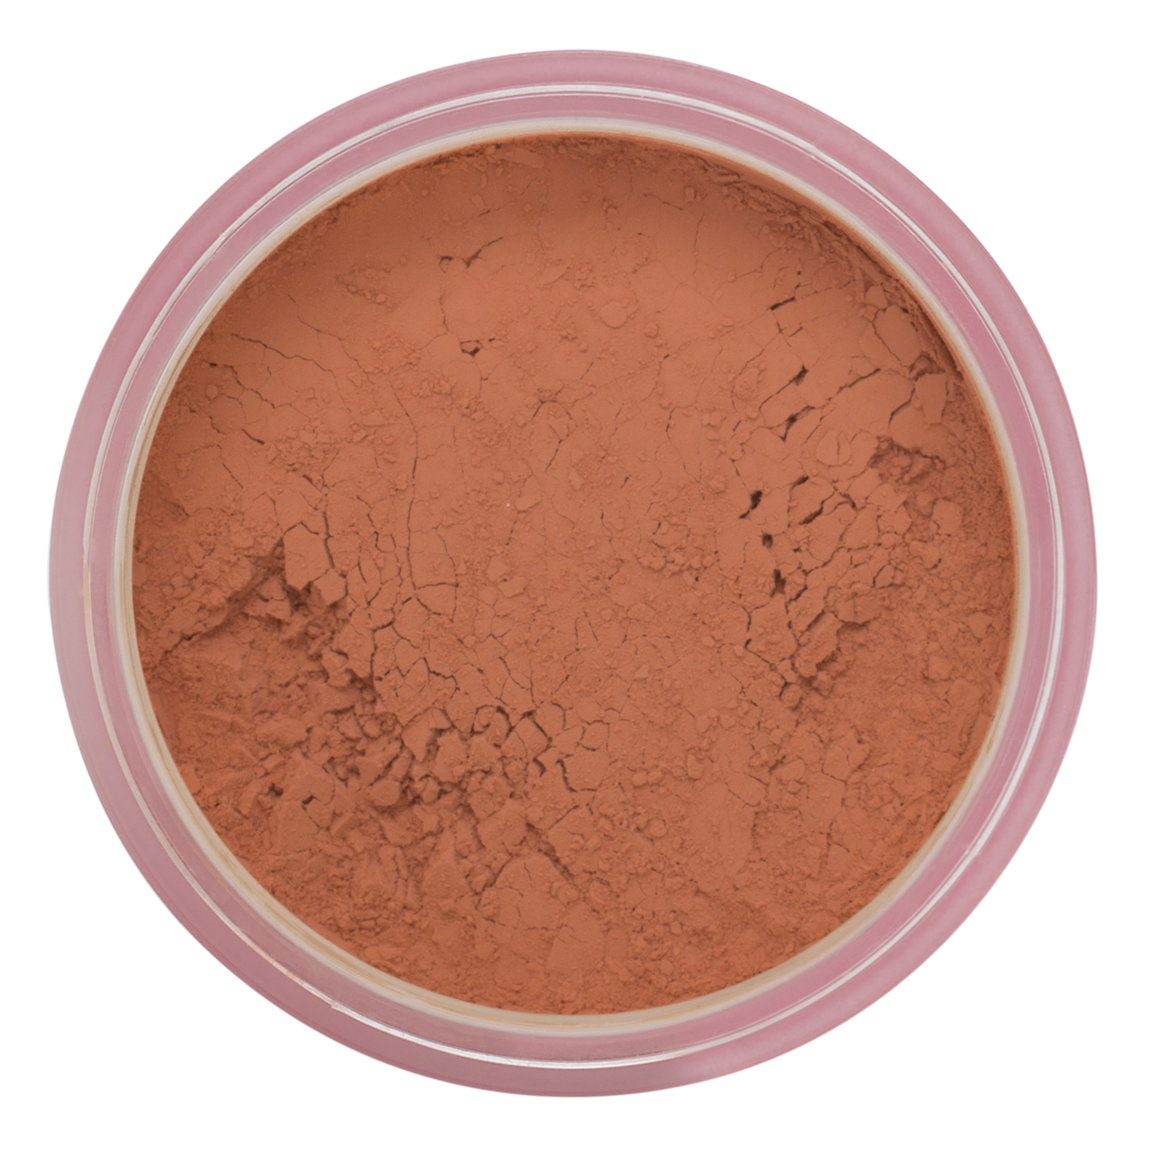 IT Cosmetics  Bye Bye Breakout Powder Tan/Rich product swatch.